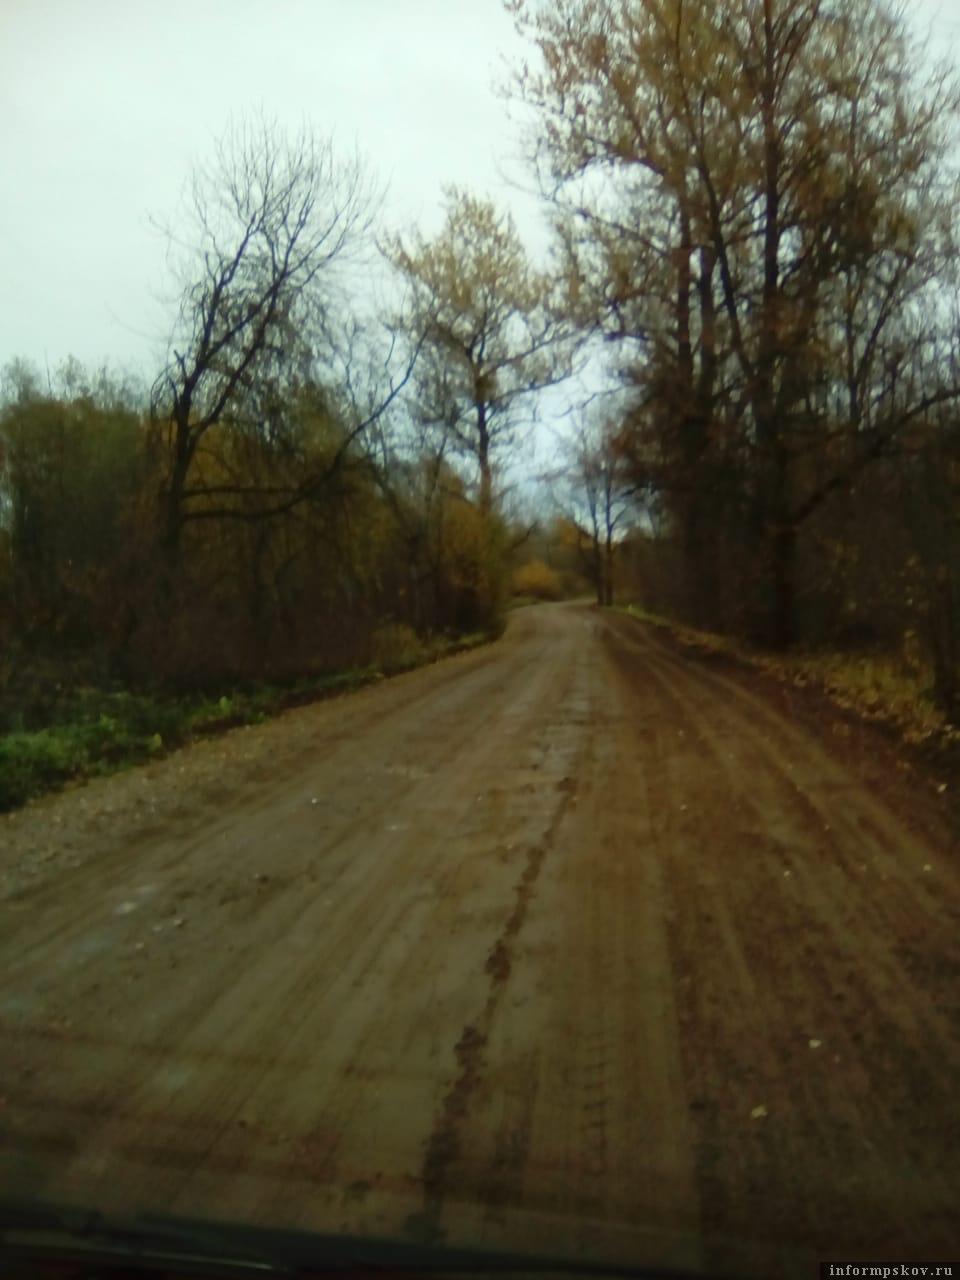 Фото комитета по транспорту и дорожному хозяйству Псковской области.